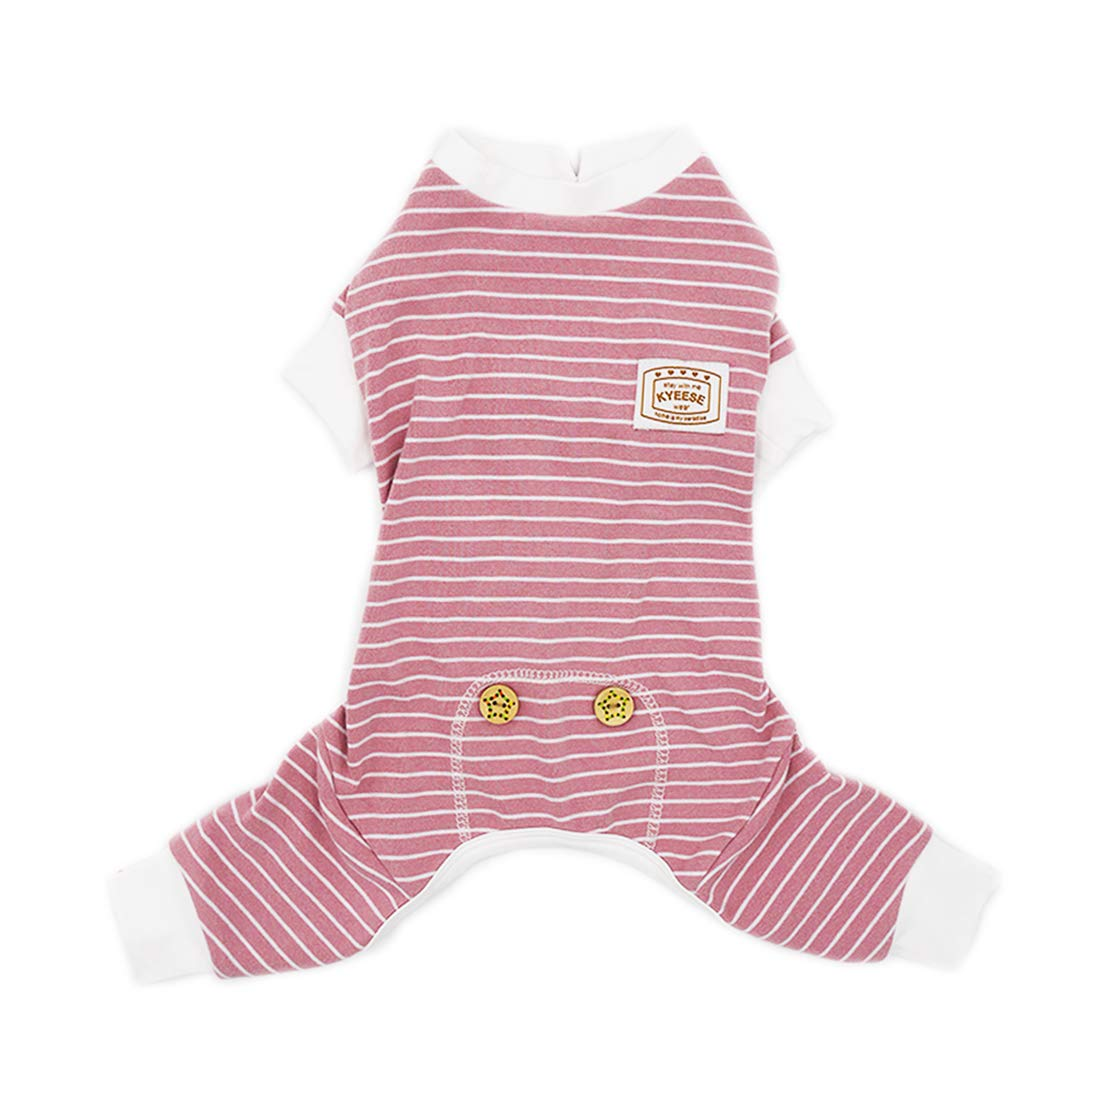 KYEESE Dog Pajamas Cotton Stretchable Dog Jumpsuit 4 Legs Strip PJS Pet Puppy Cat Pajamas Lightweight